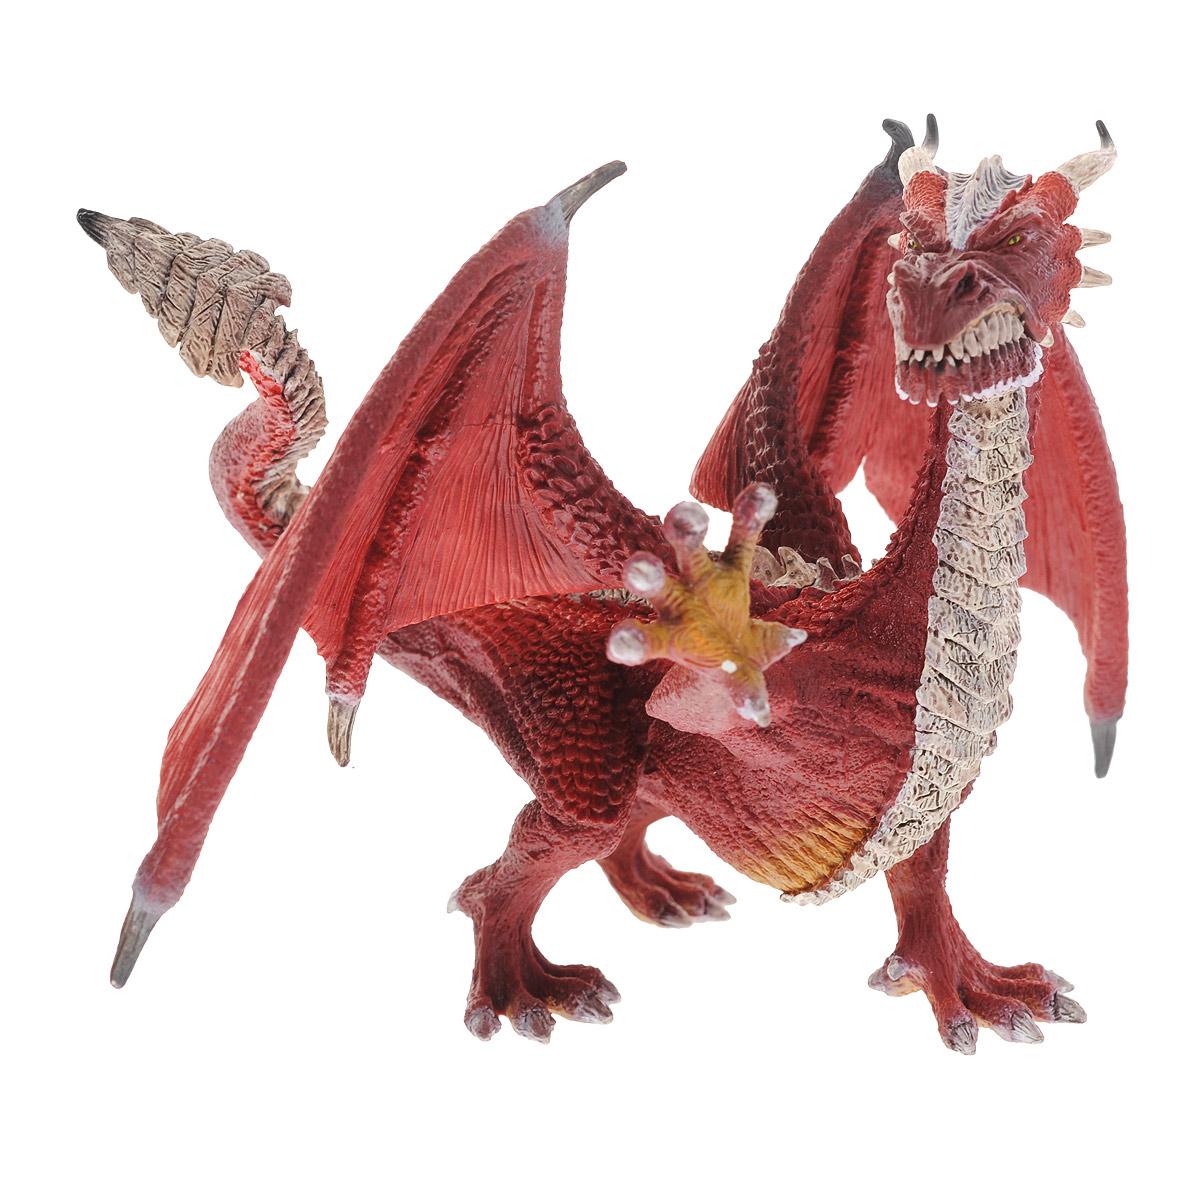 Schleich Фигурка Дракон Воин фигурки игрушки schleich дракон воин